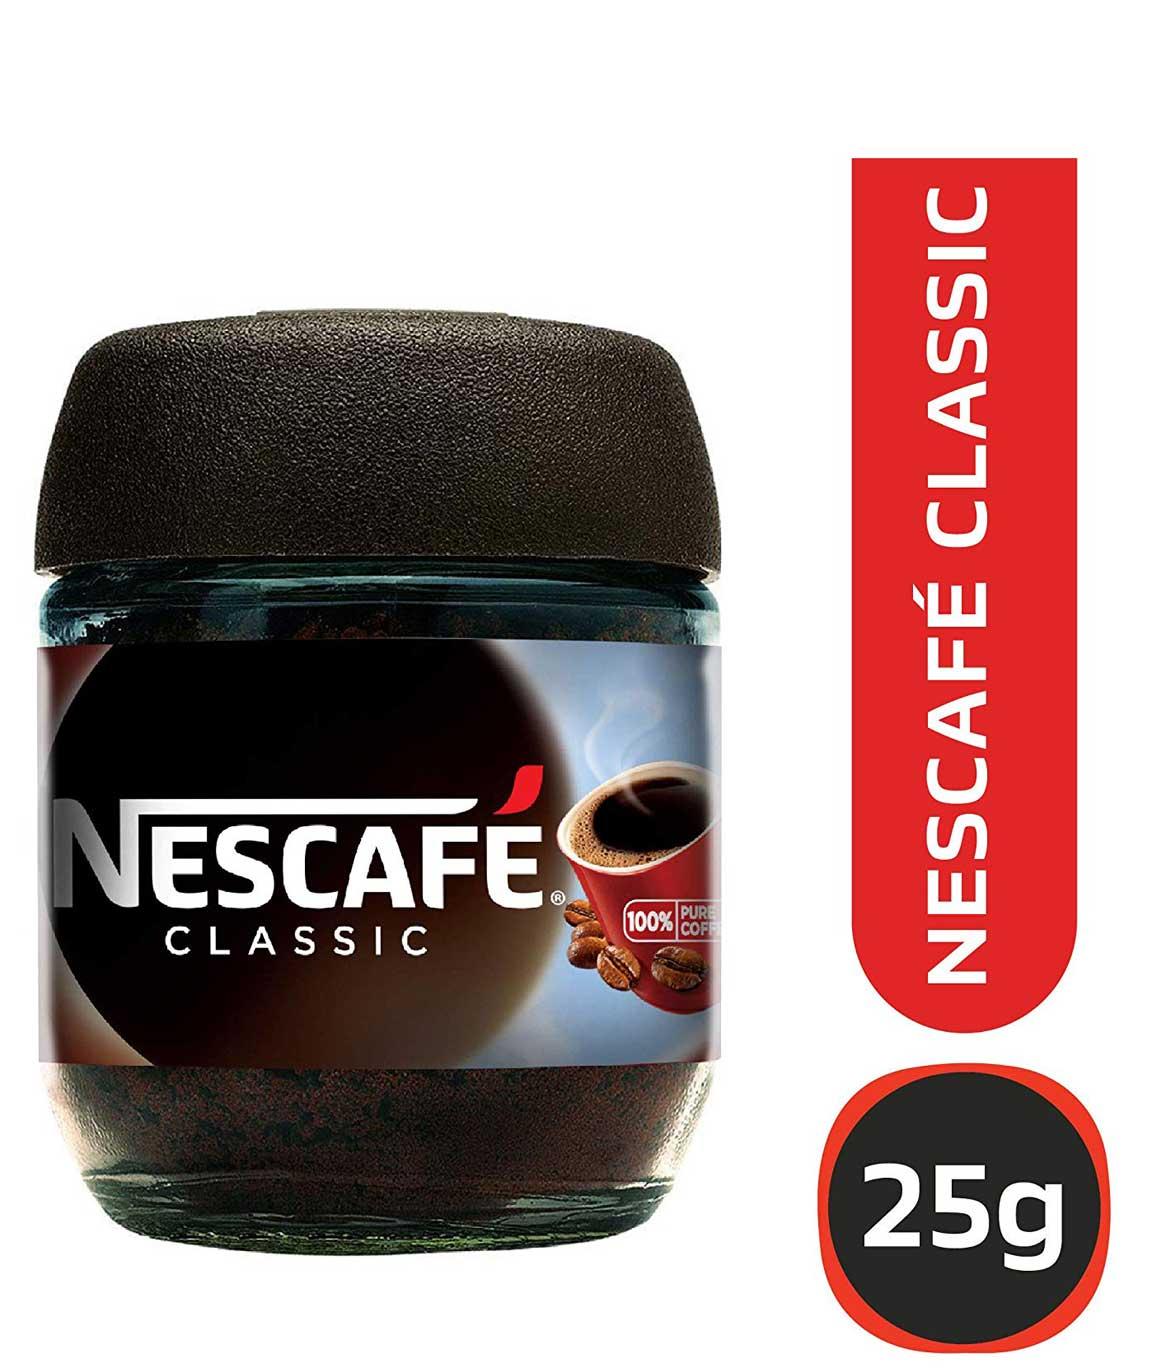 Nescafé Classic Coffee, 25g Dawn Jar